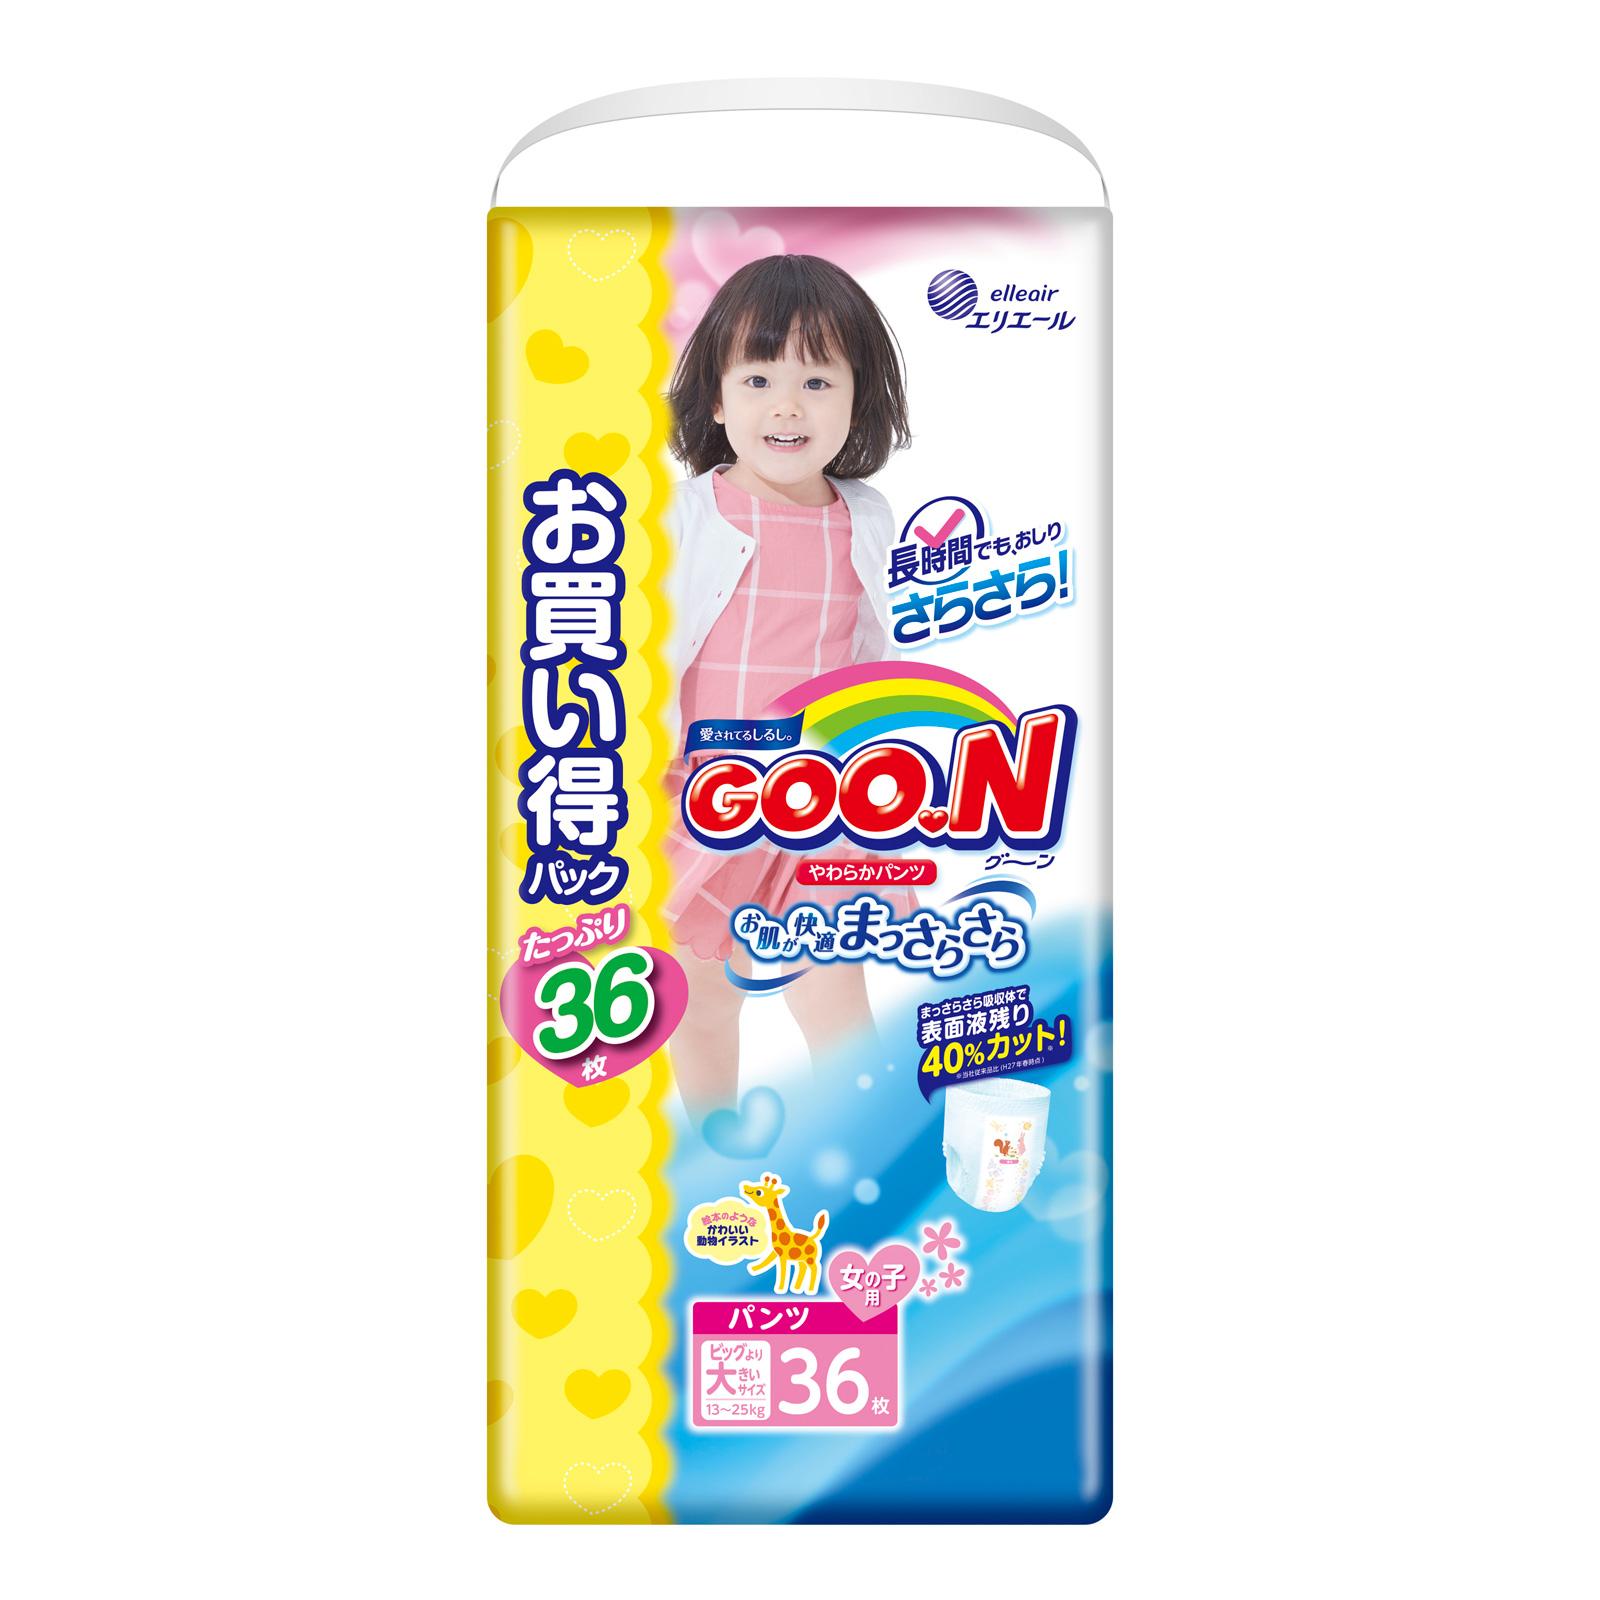 Трусики Goon для девочек 13-25 кг (36 шт) Размер XXL<br>